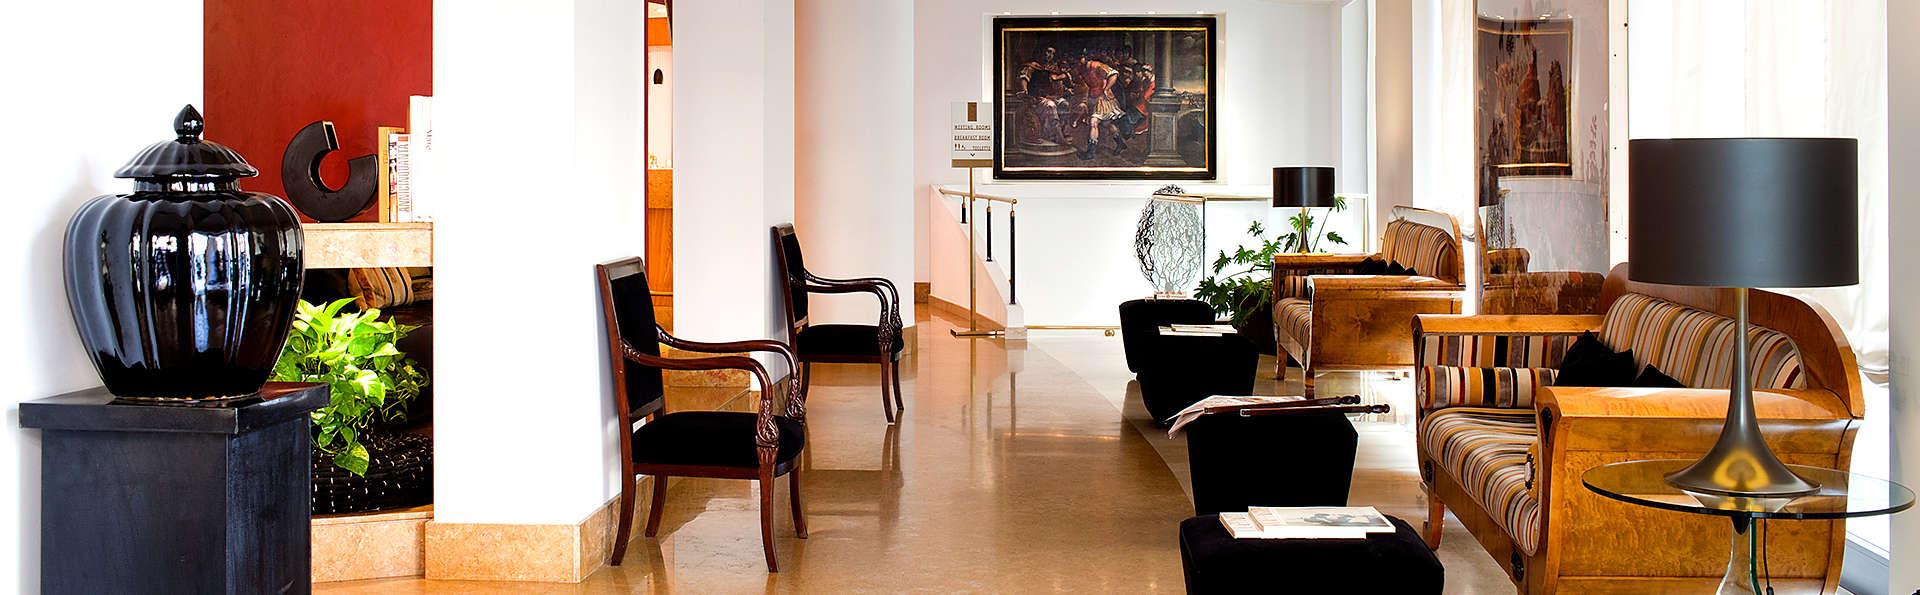 Hotel Plaza Opéra - Edit_Lobby2.jpg